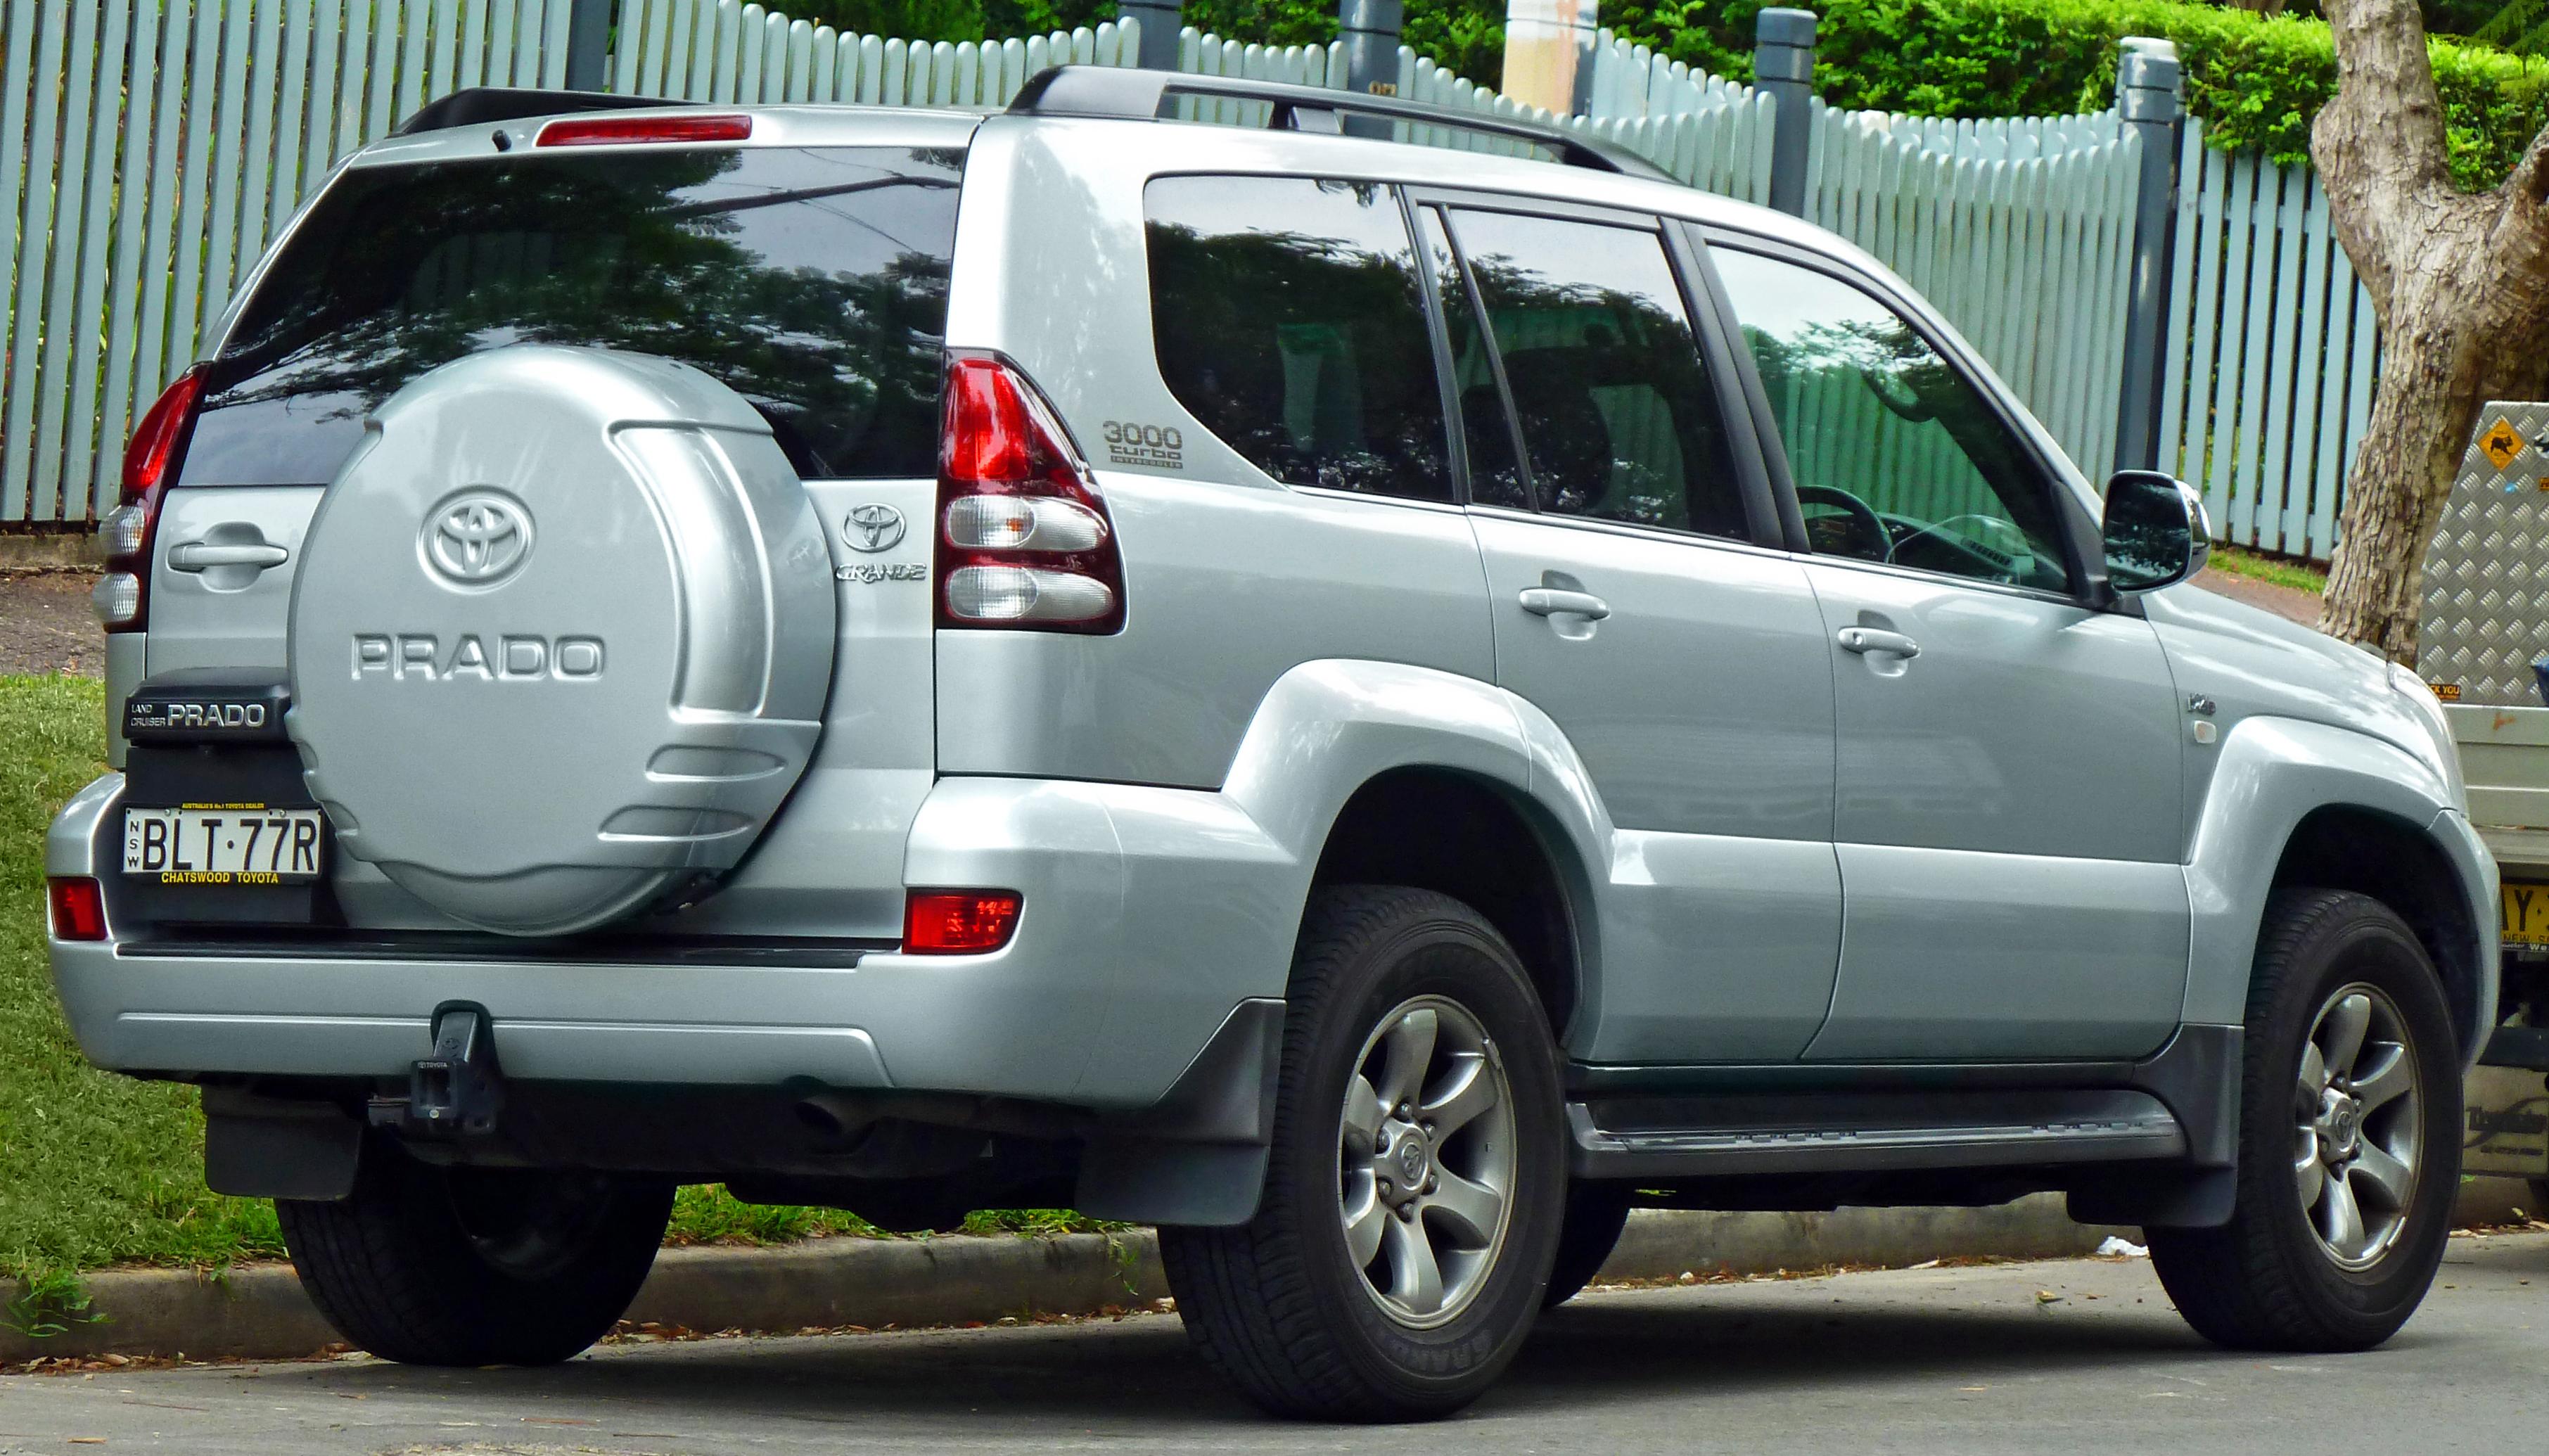 Toyota Land Cruiser Wiki >> File:2006-2009 Toyota Land Cruiser Prado (KDJ120R) Grande wagon (2011-03-10).jpg - Wikimedia Commons